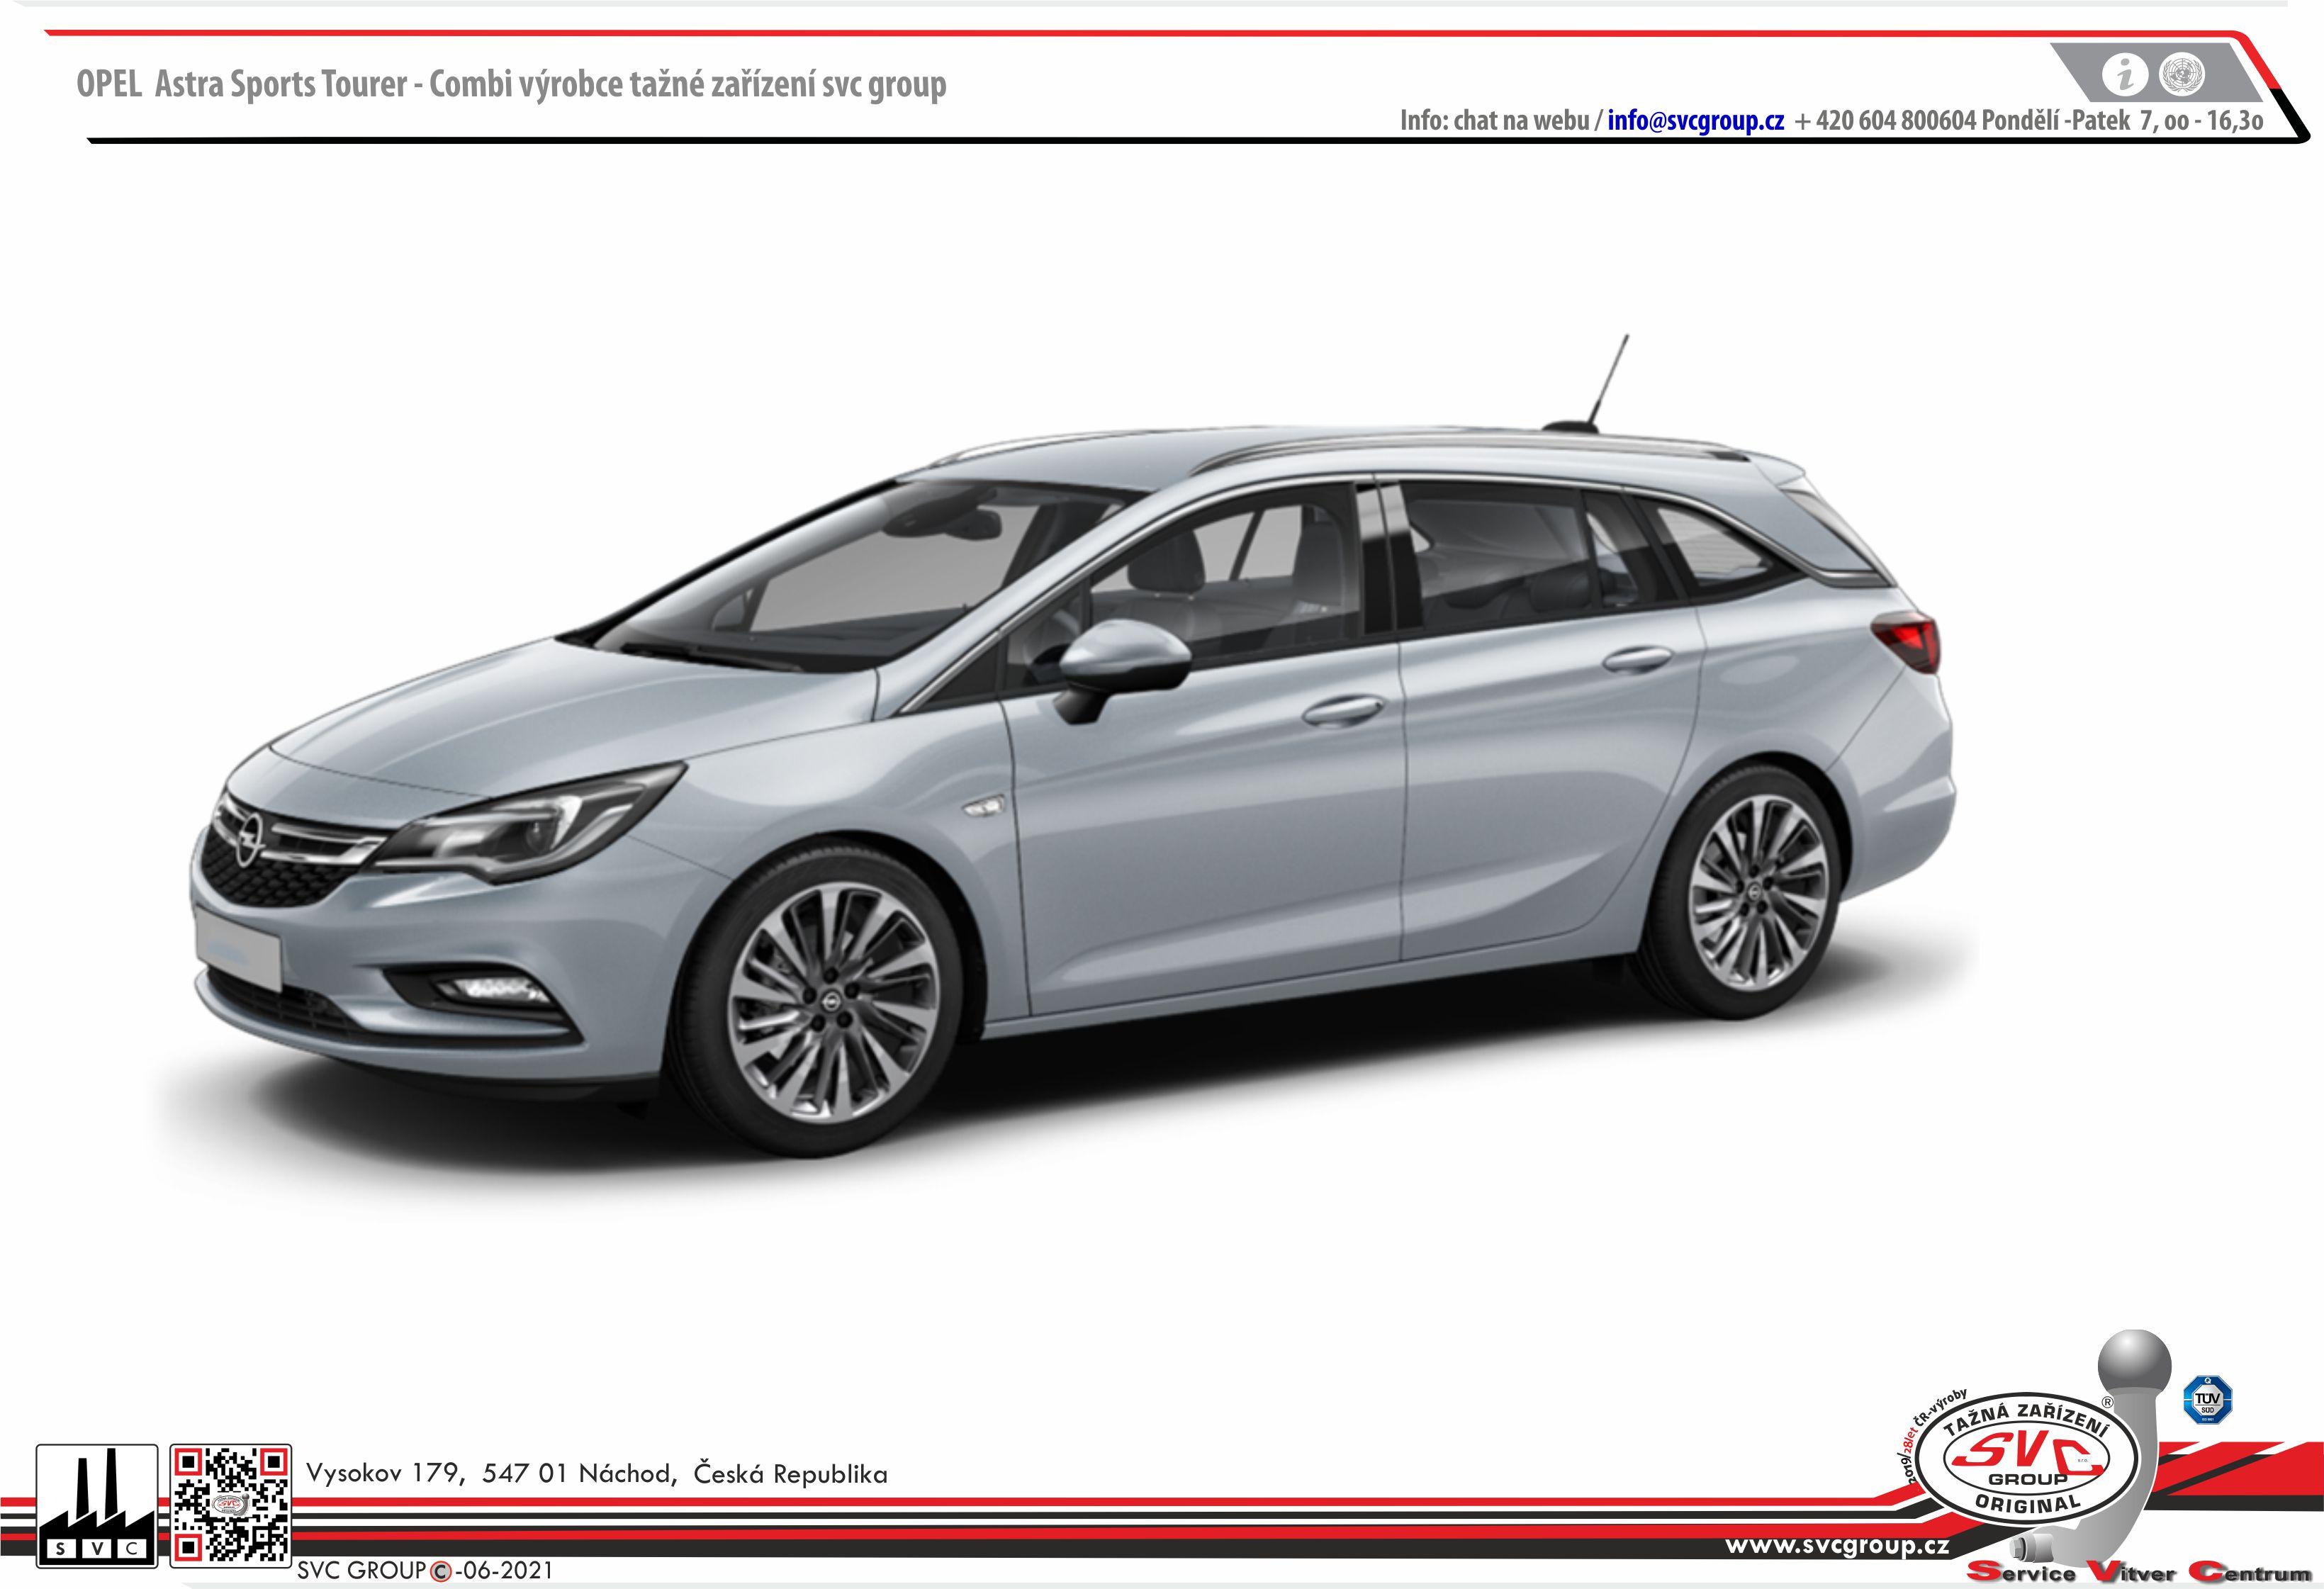 Opel Astra K - Kombi